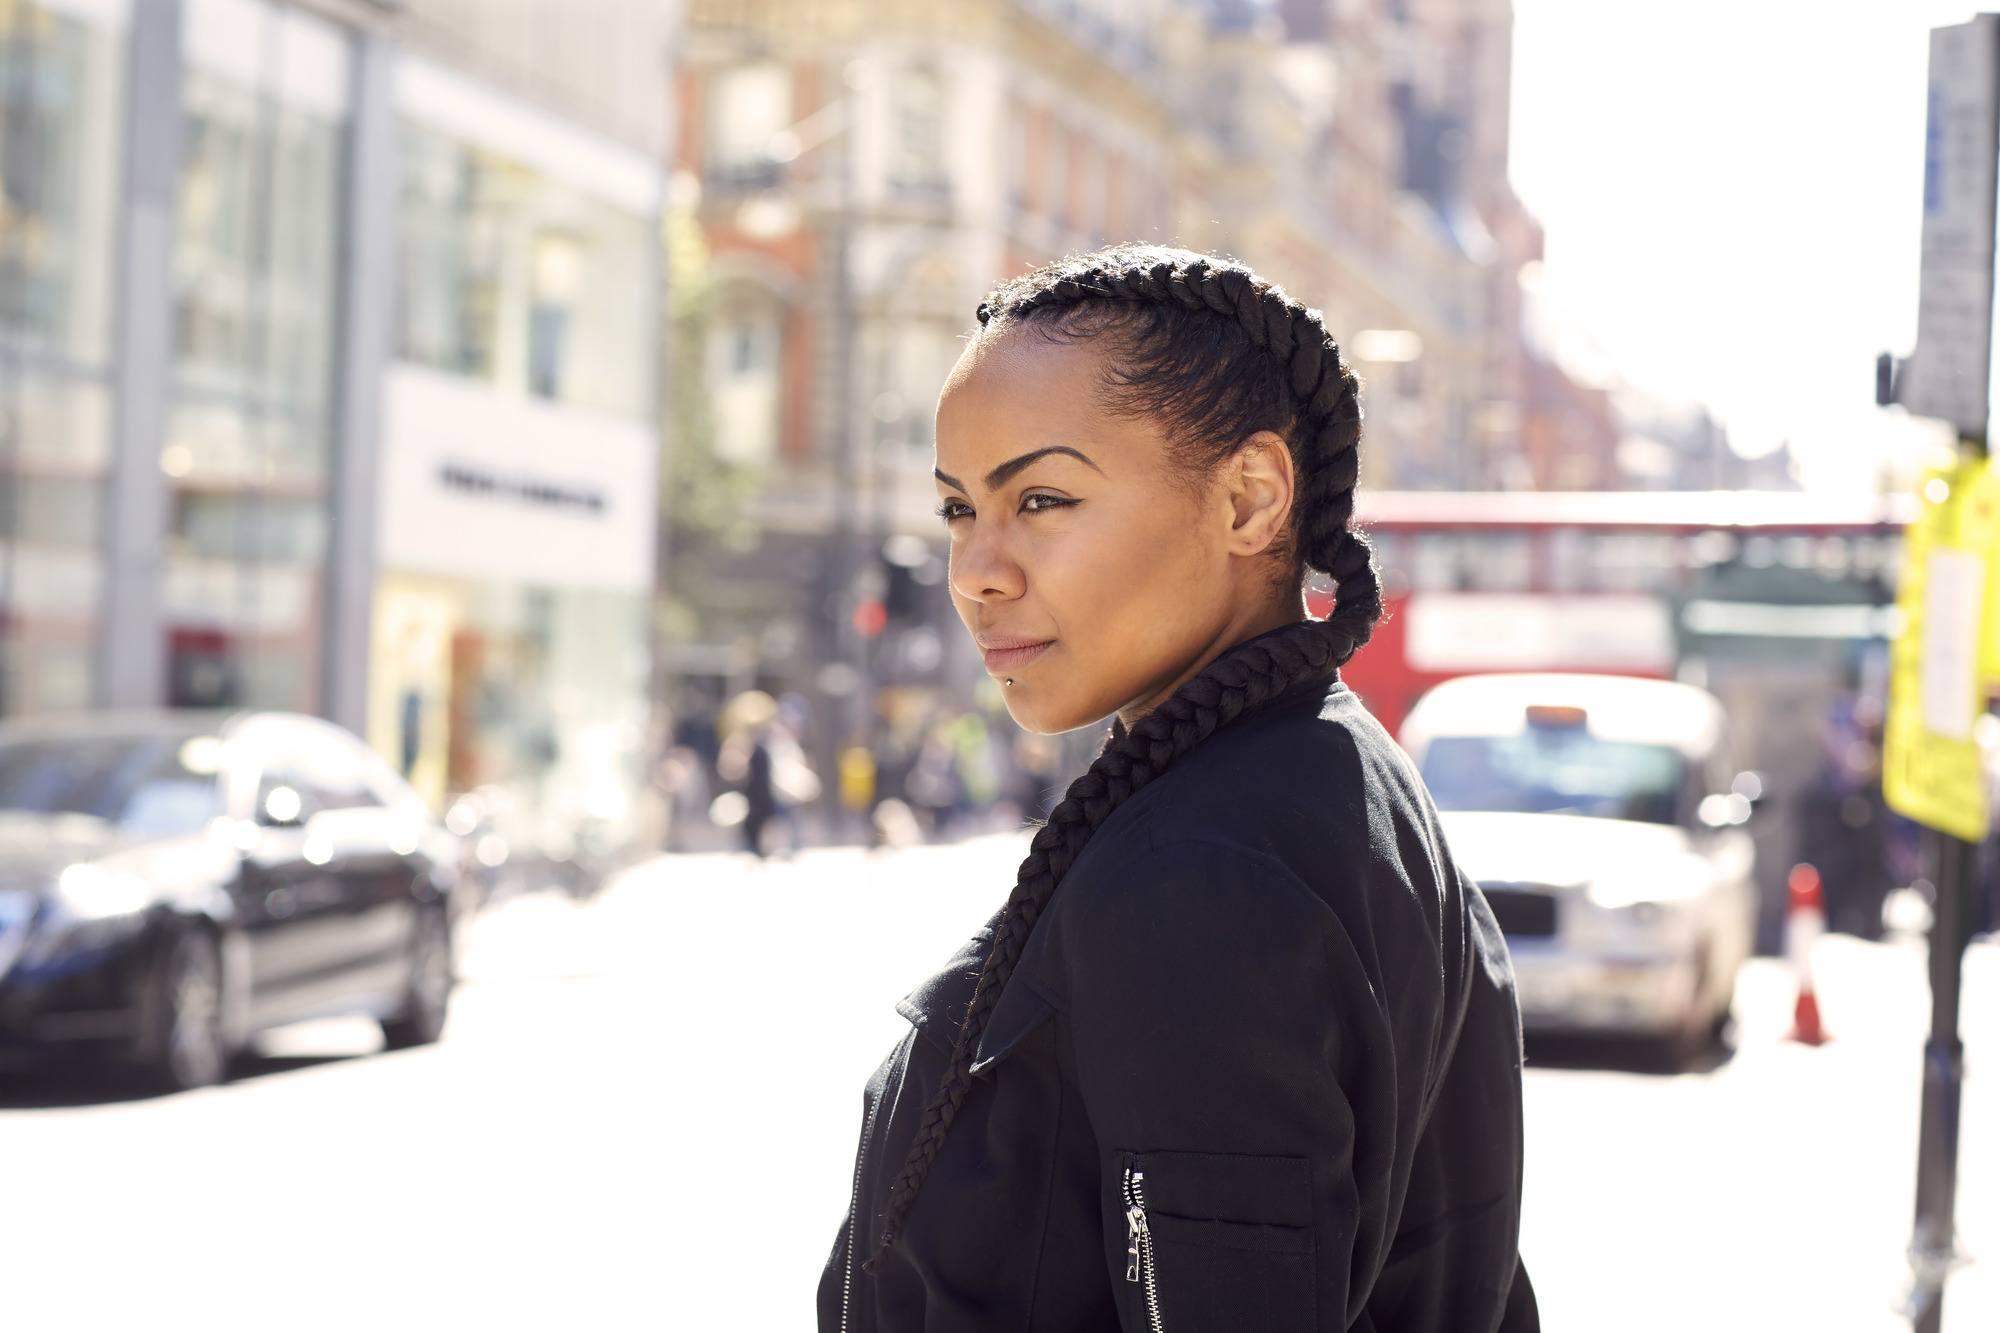 Boxer braid step by step: young black woman with cornrows/ Dutch braids/boxer braids